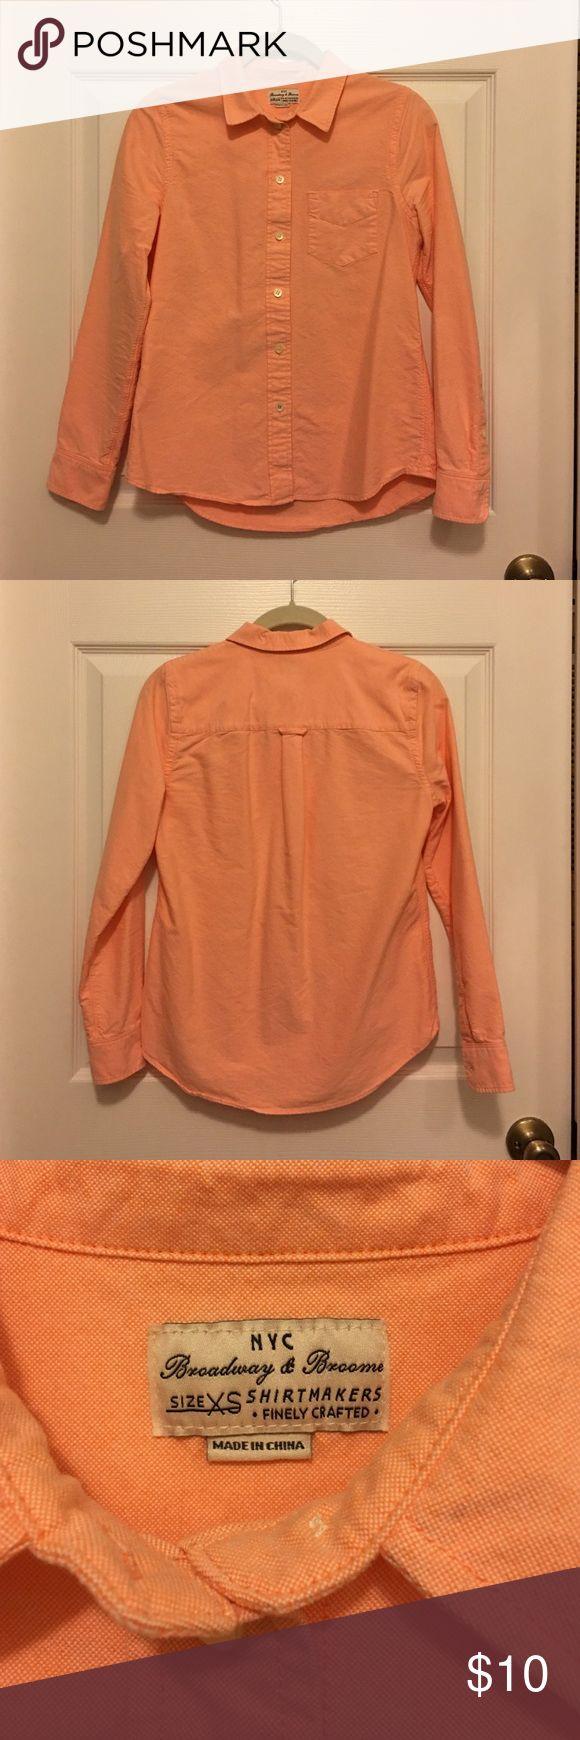 Light Orange Women's Oxford Shirt from Madewell 100% cotton light orange high-quality women's Oxford button down shirt from Madewell. Madewell Tops Button Down Shirts